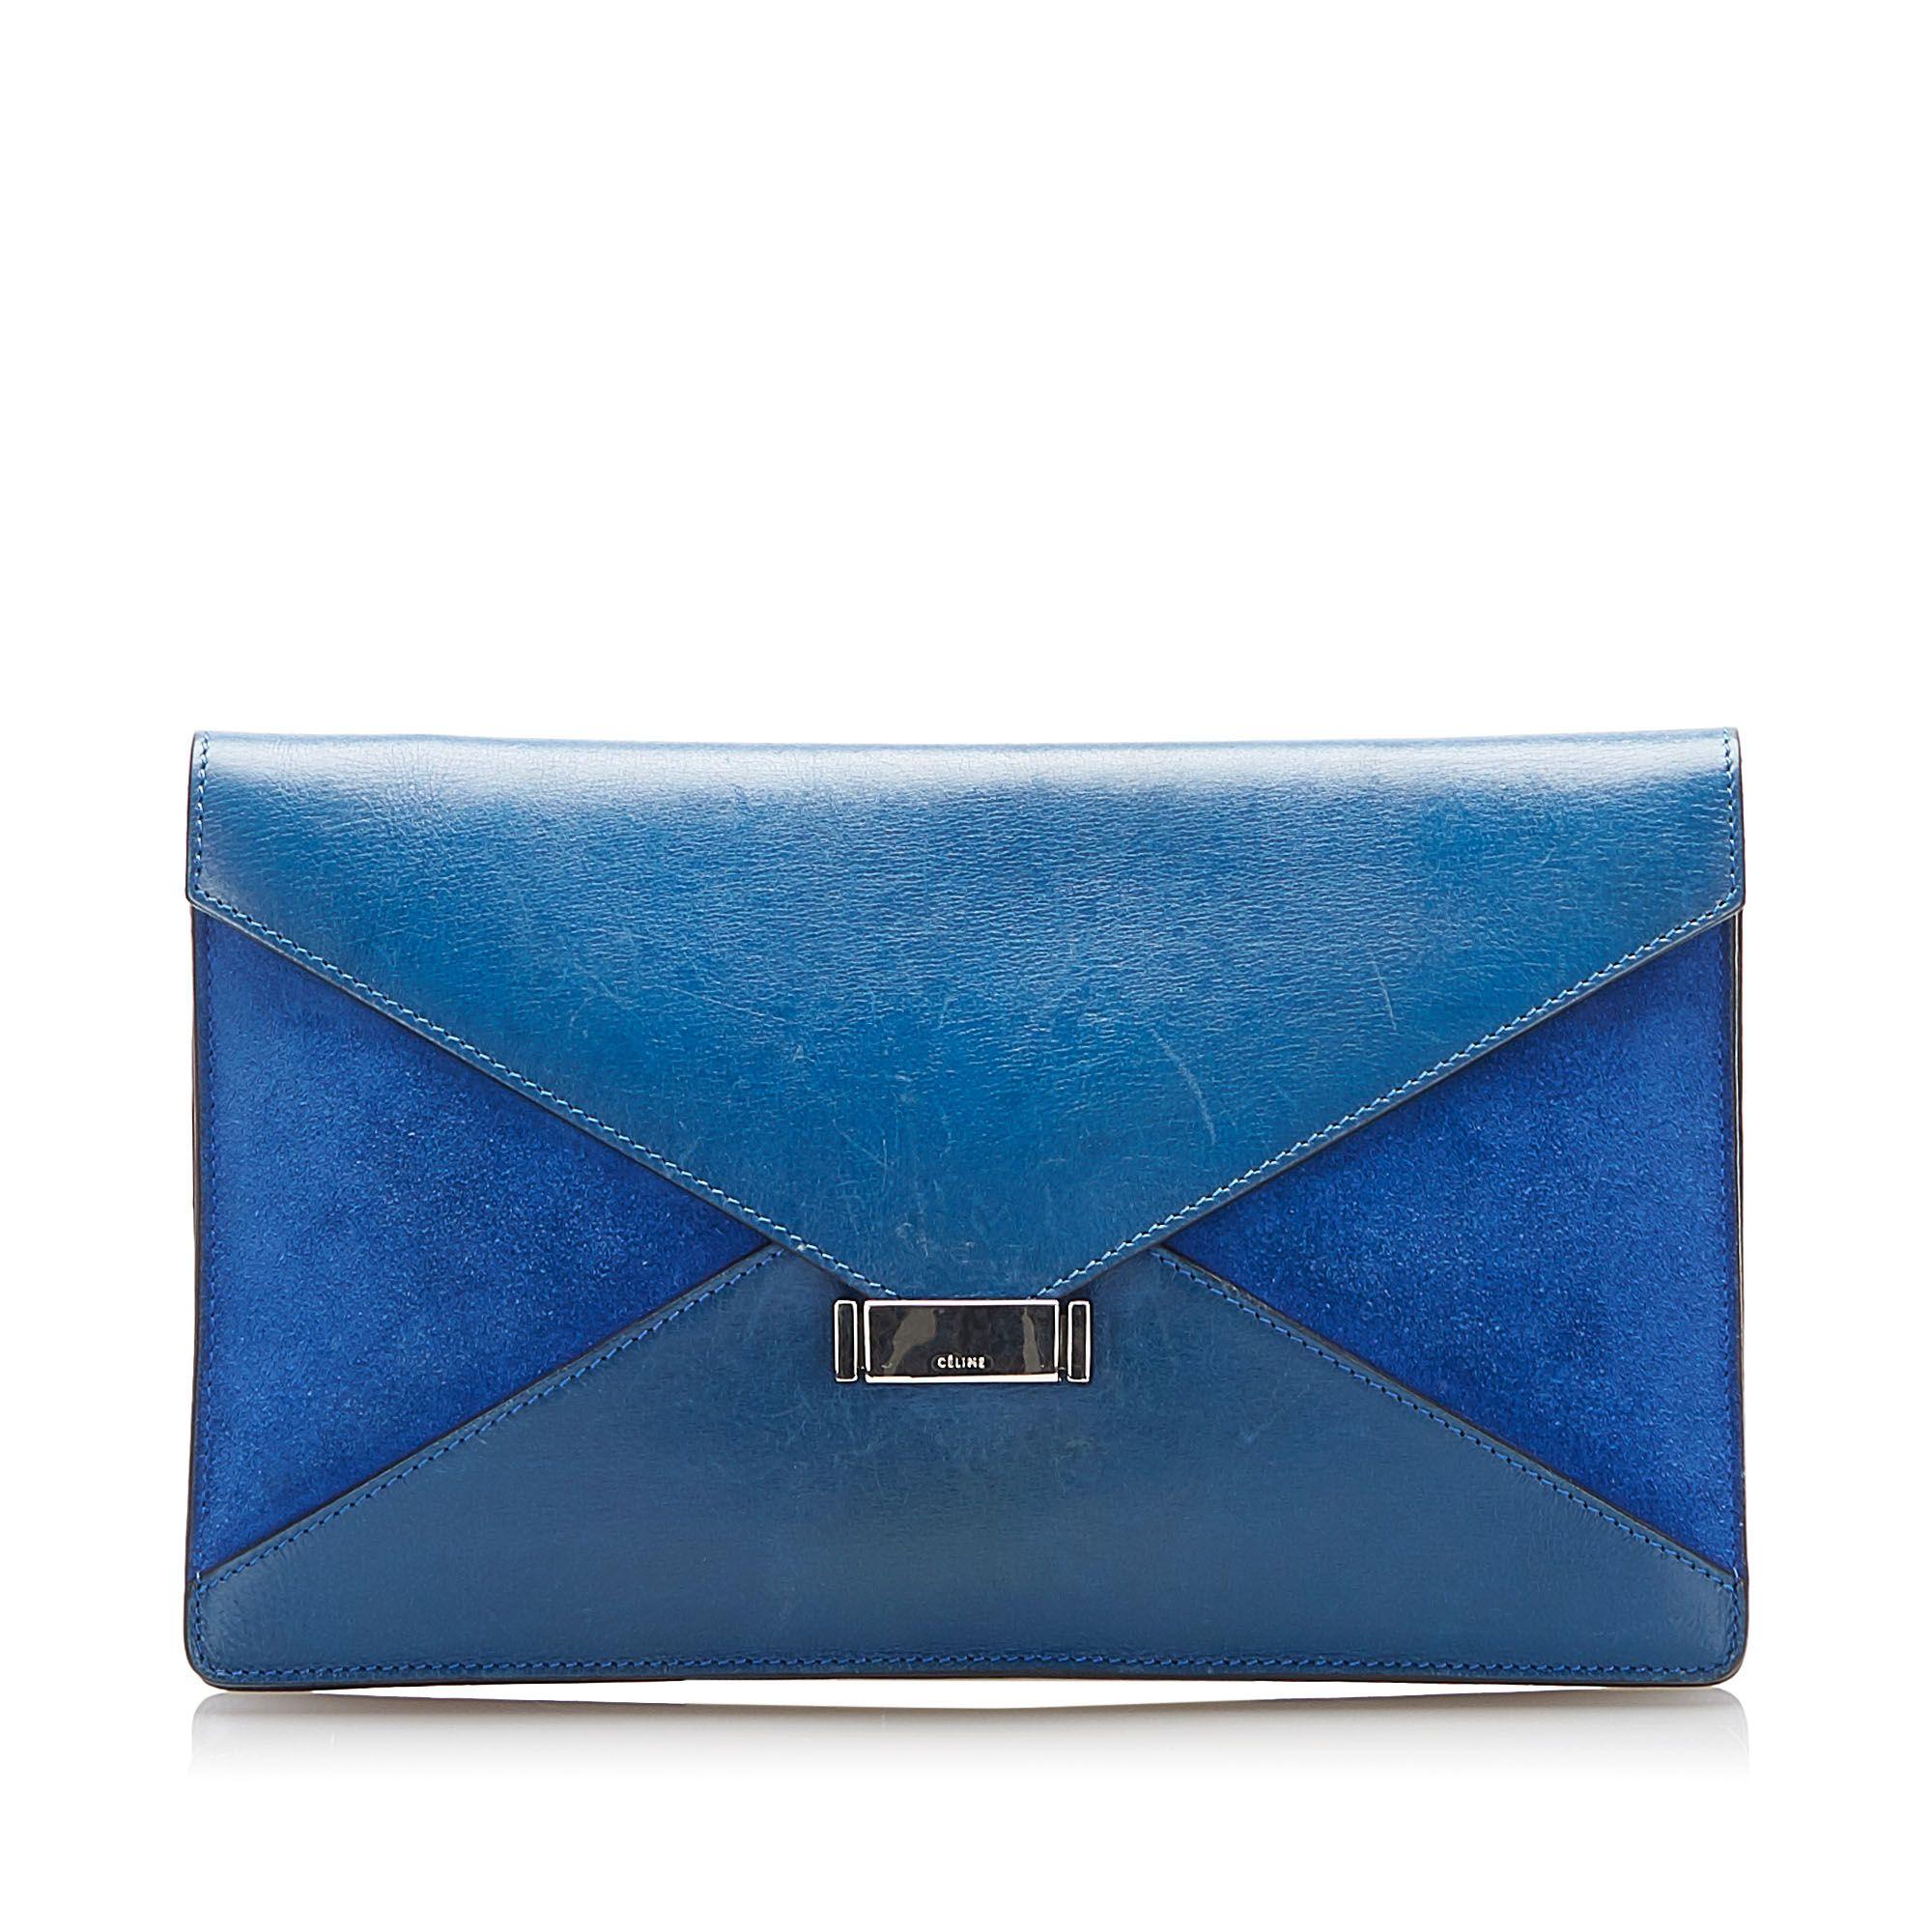 Vintage Celine Diamond Leather Clutch Bag Blue